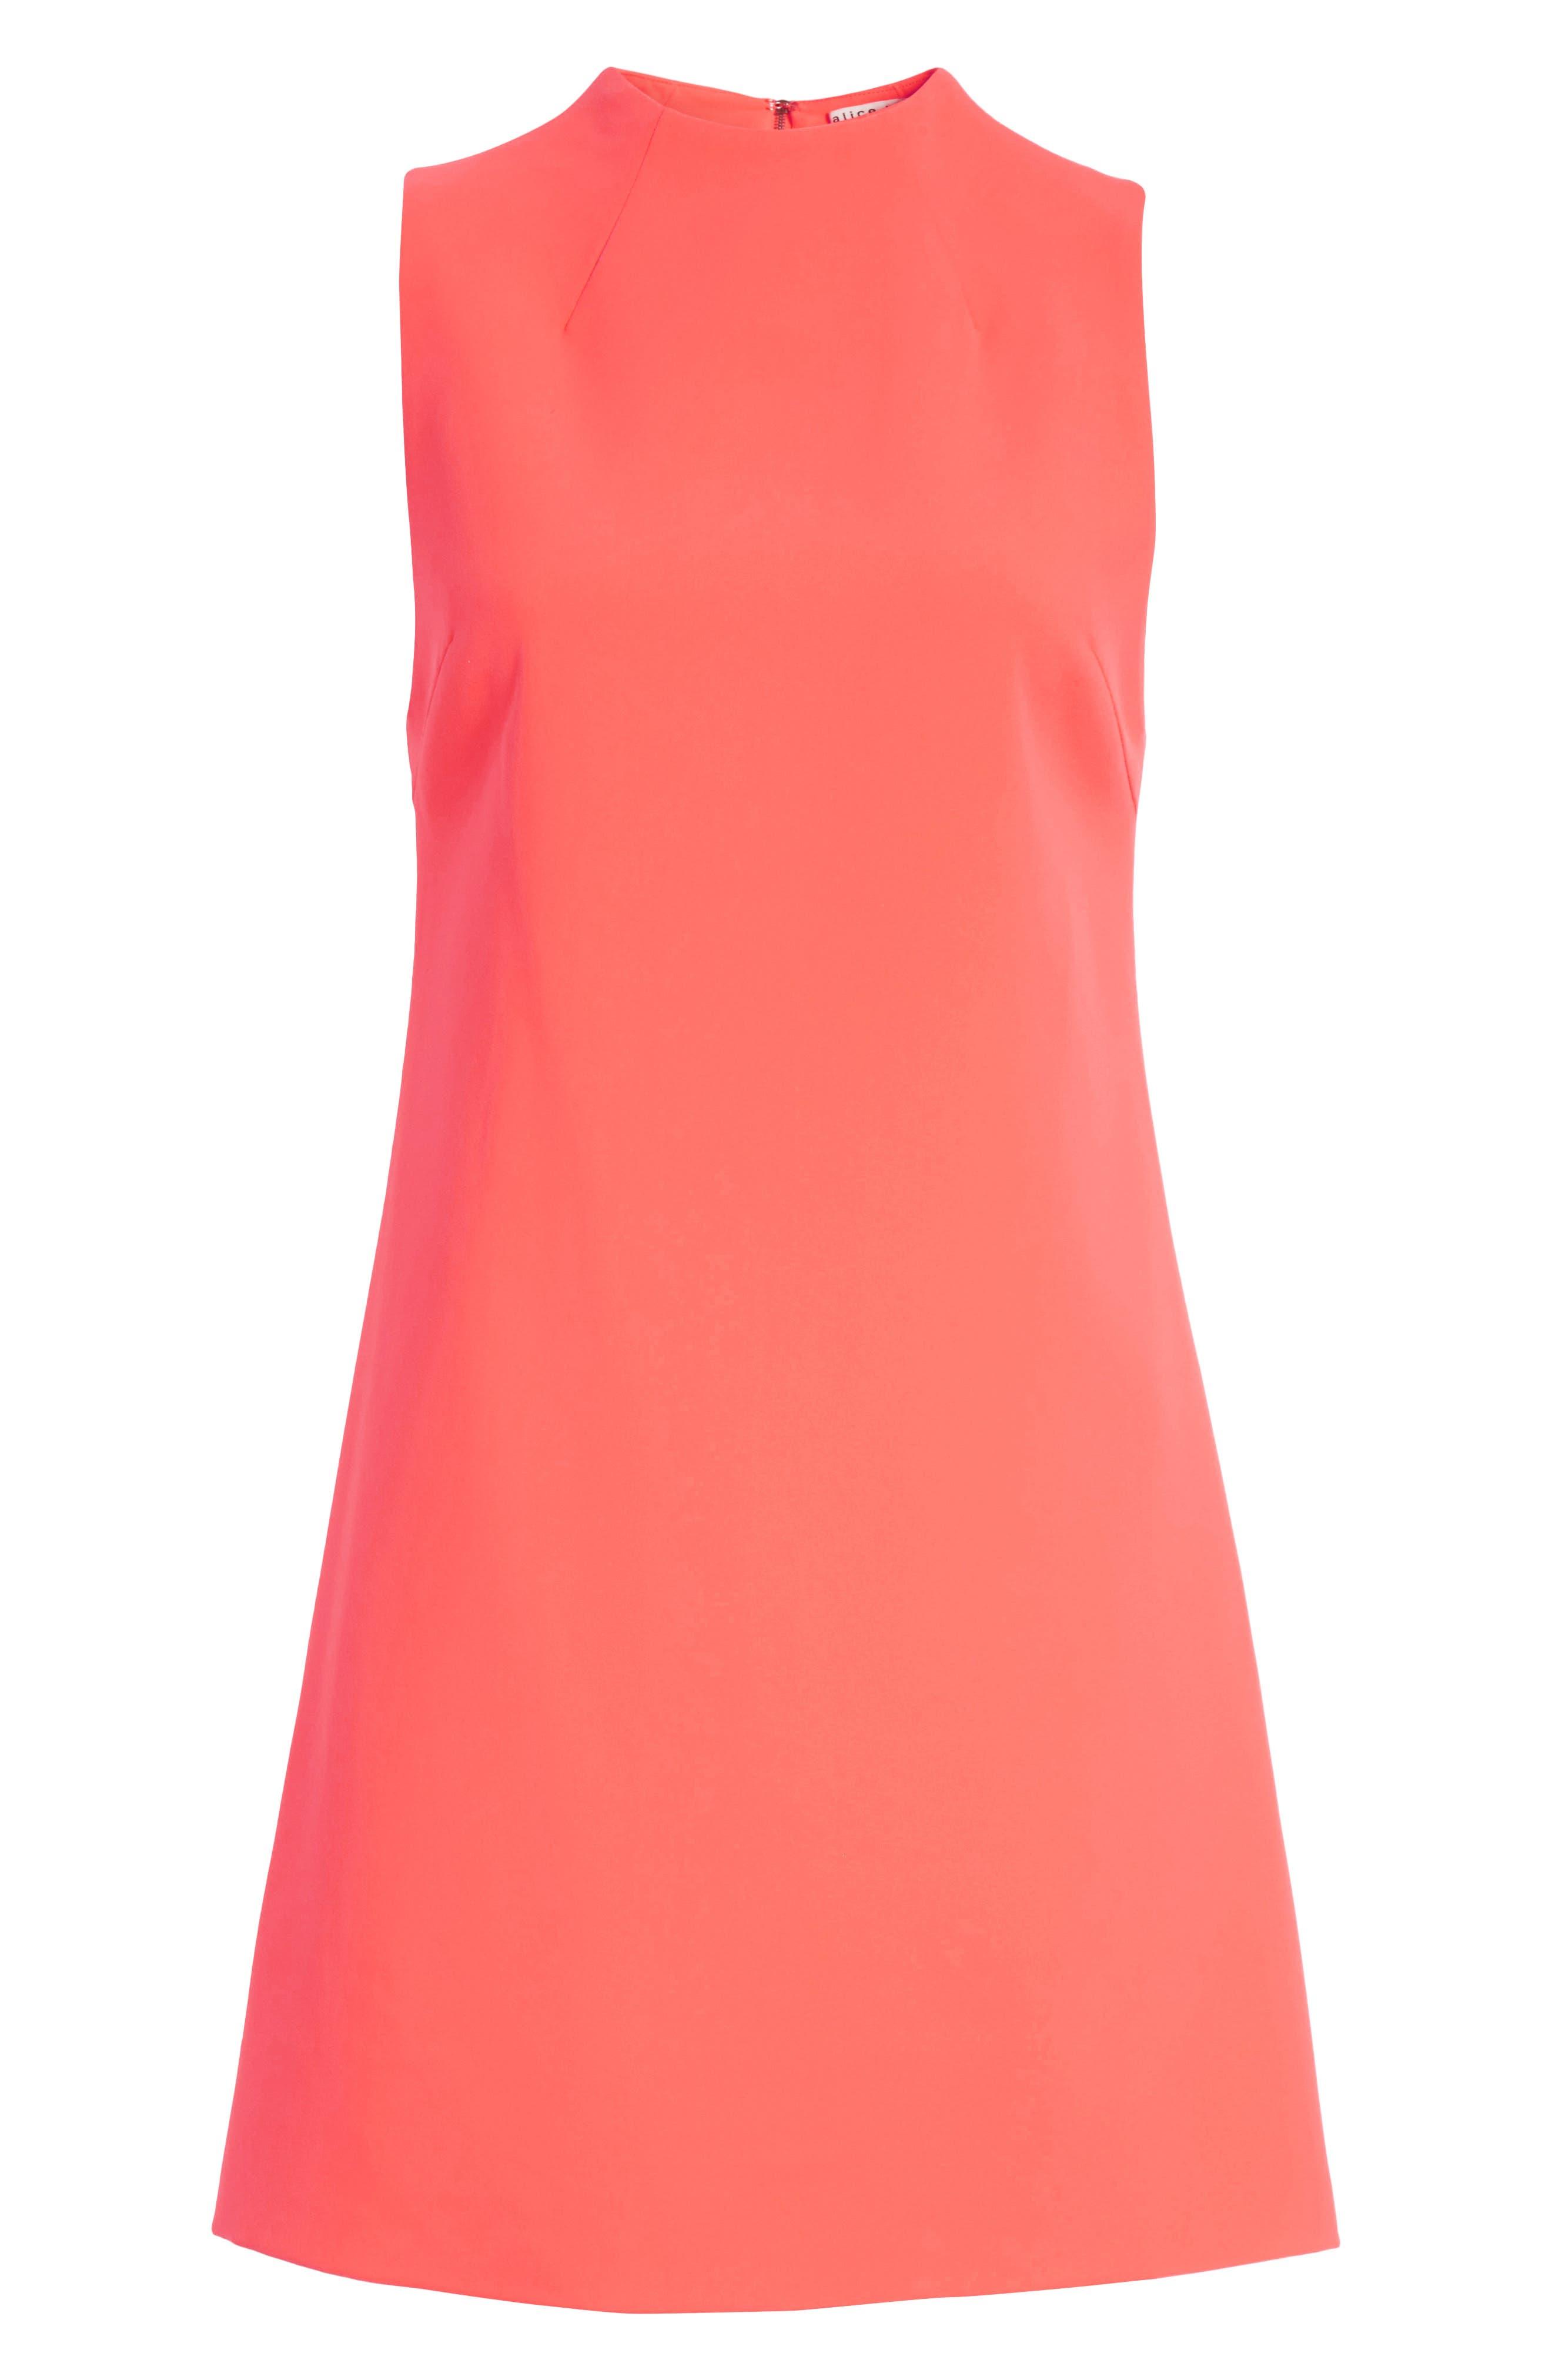 Coley A-Line Shift Dress,                             Alternate thumbnail 7, color,                             800